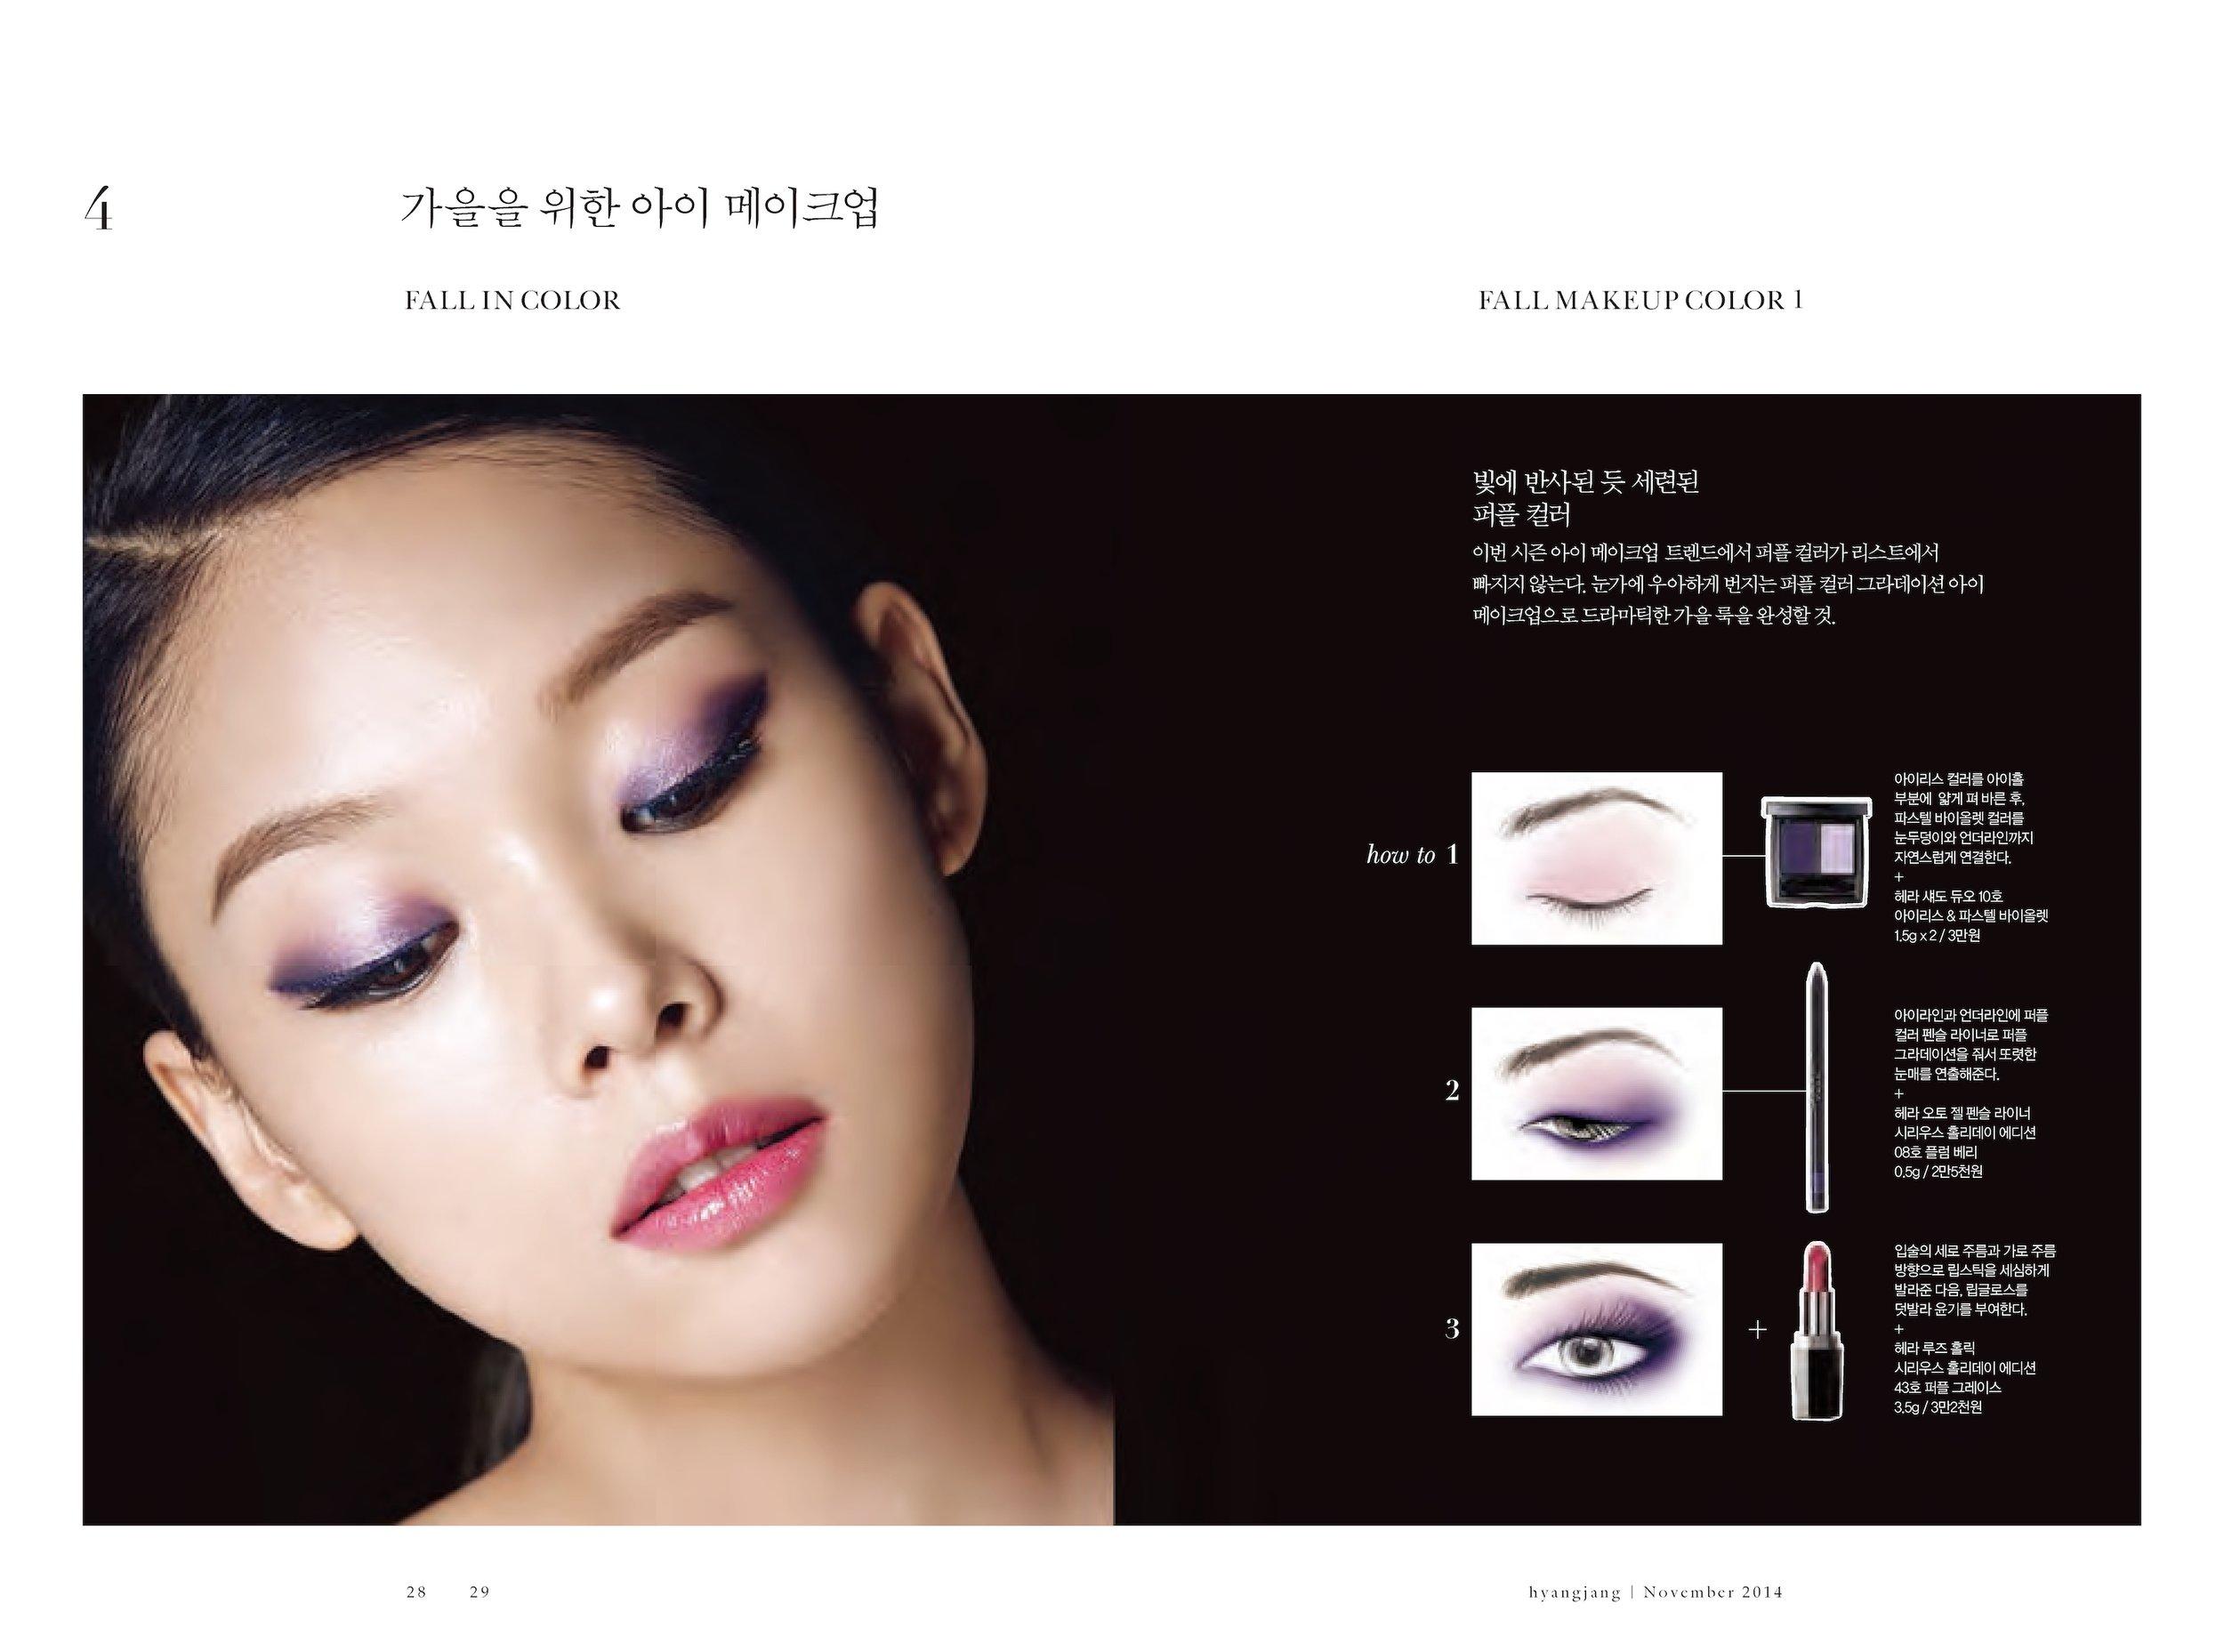 hyangjang-201411_페이지_15.jpeg